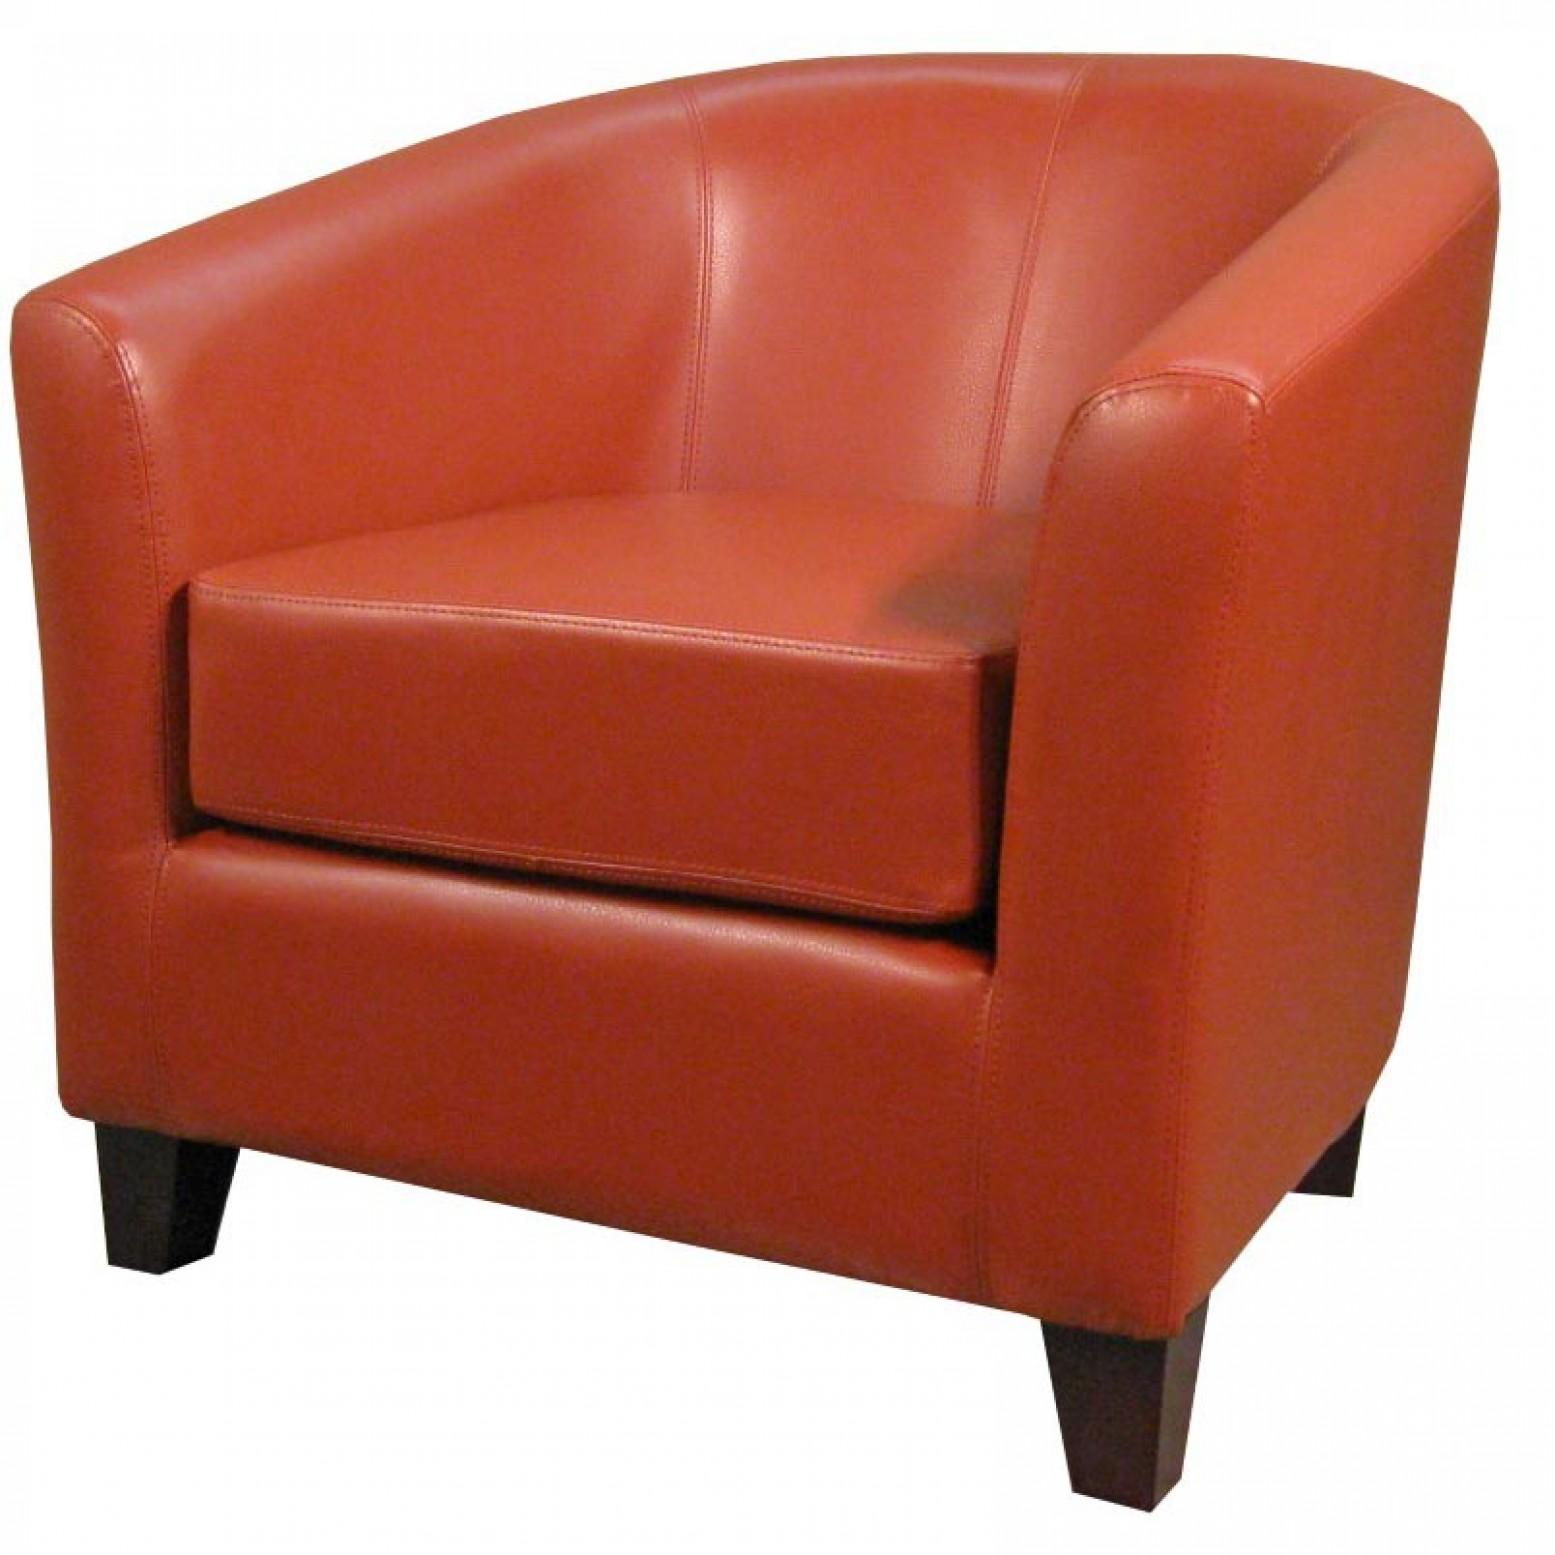 Fine Hayden Bonded Leather Tub Chair Pumpkin Creativecarmelina Interior Chair Design Creativecarmelinacom